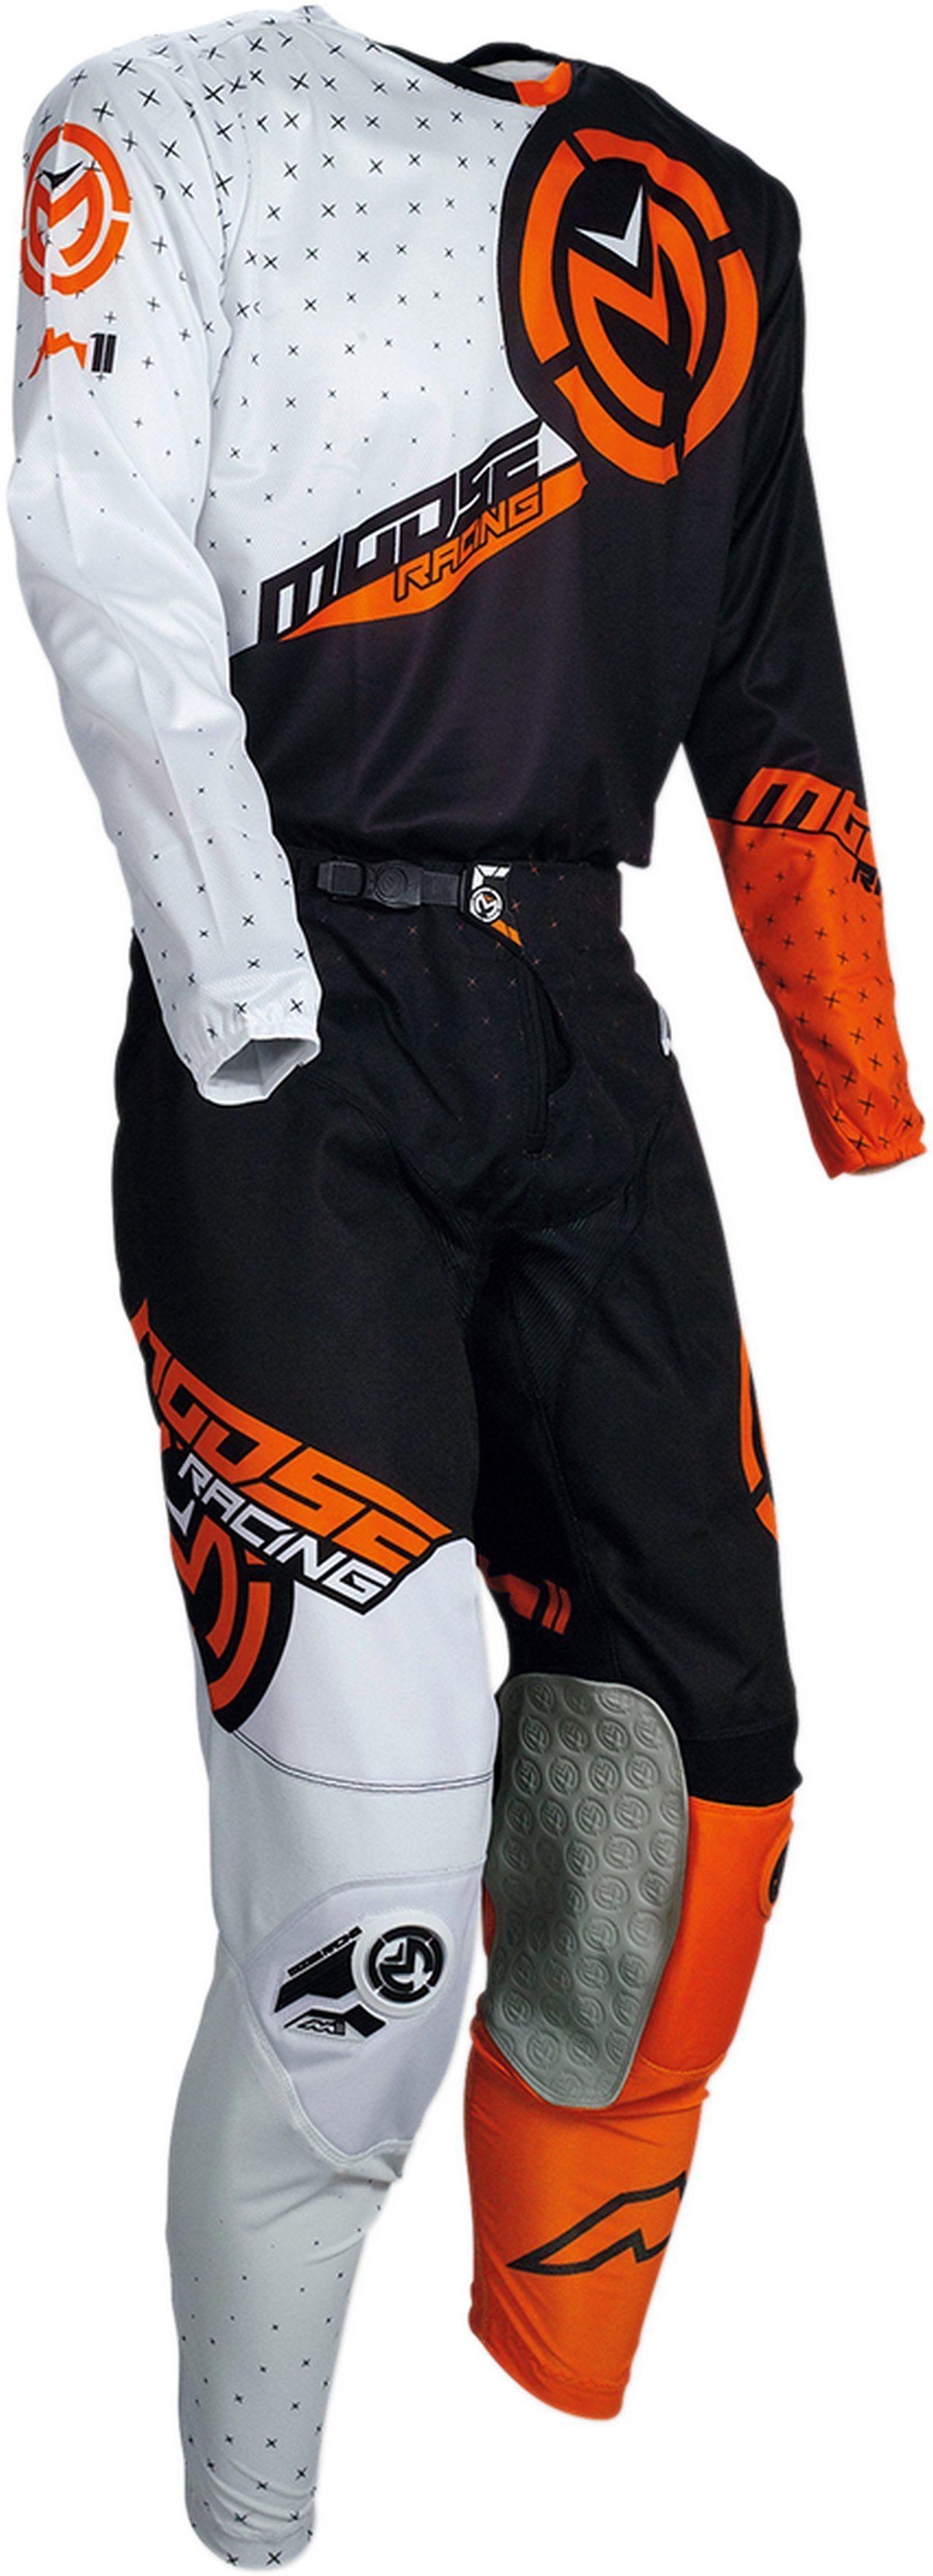 【MOOSE RACING】M1 越野車衣 [2910-4519] - 「Webike-摩托百貨」